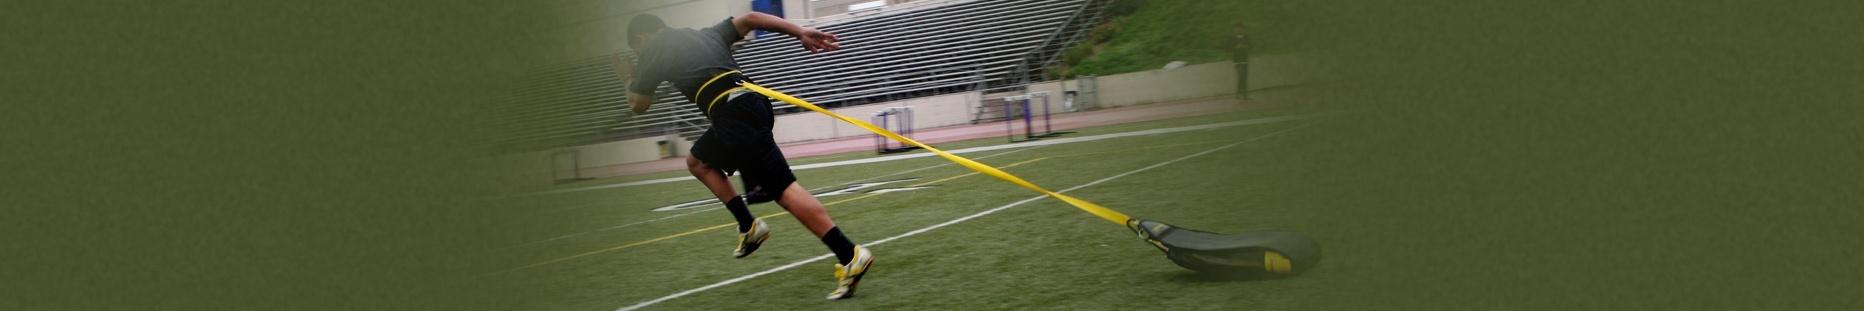 Football Training Tips